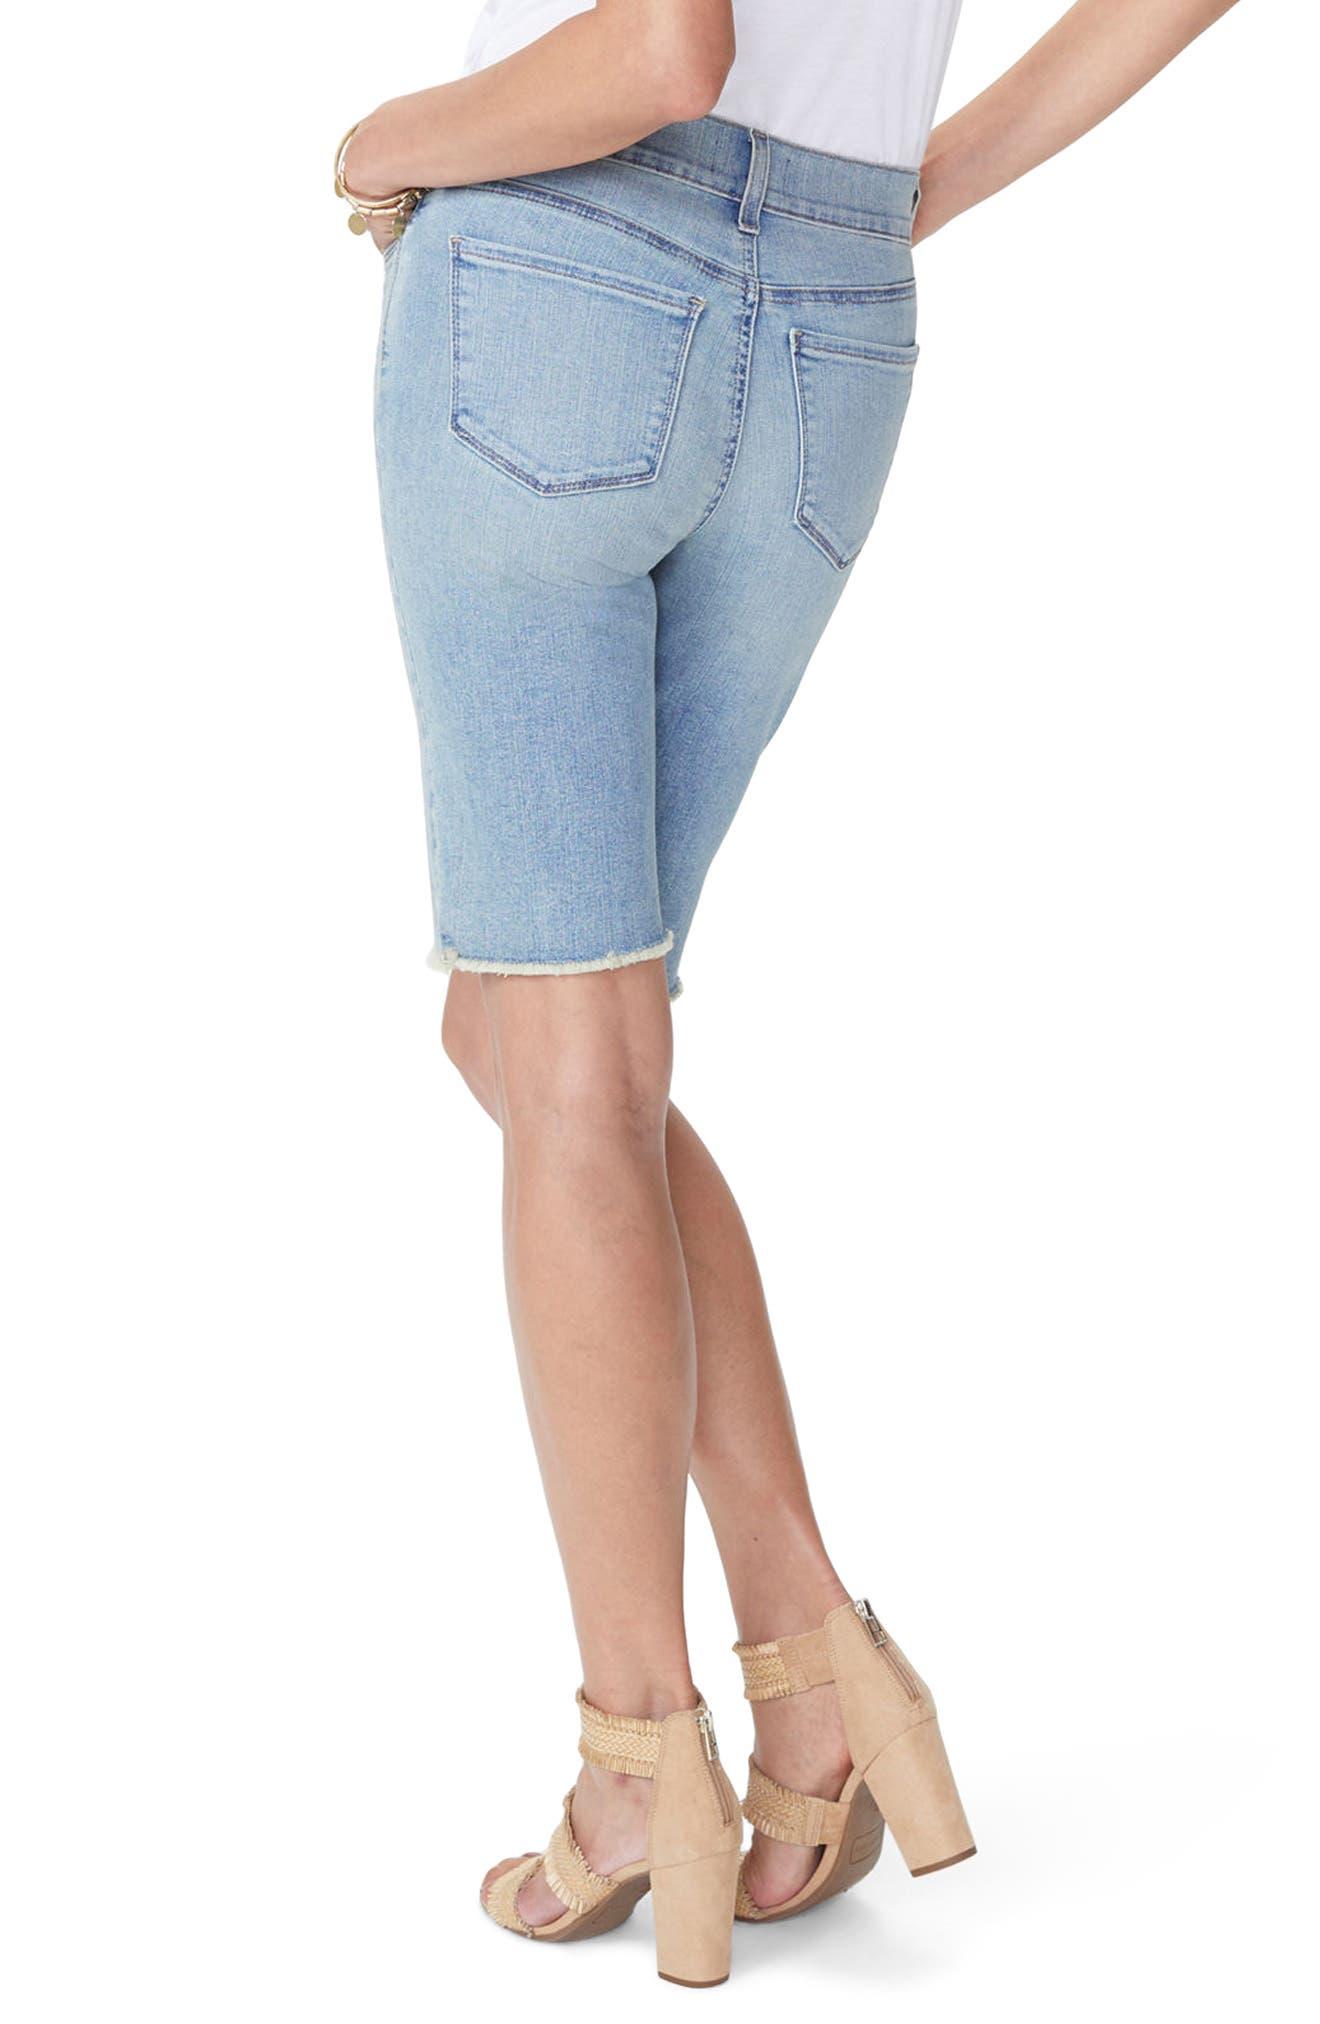 Briella Frayed Hem Denim Bermuda Shorts,                             Alternate thumbnail 2, color,                             WESTLAND